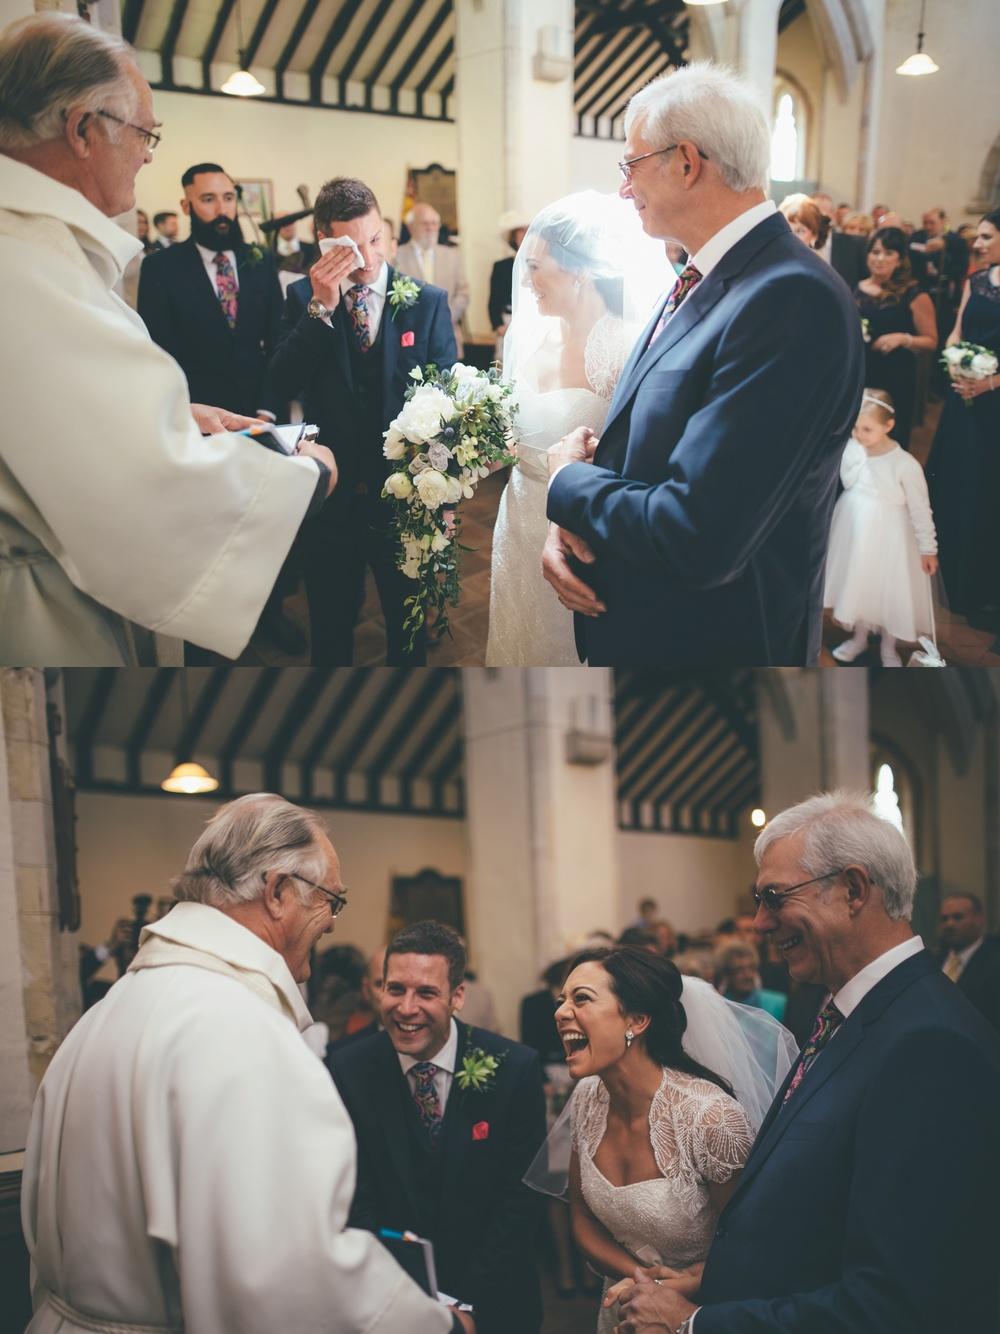 ClaireKieranwedding_PrestonCourtCanterbury_0011.jpg